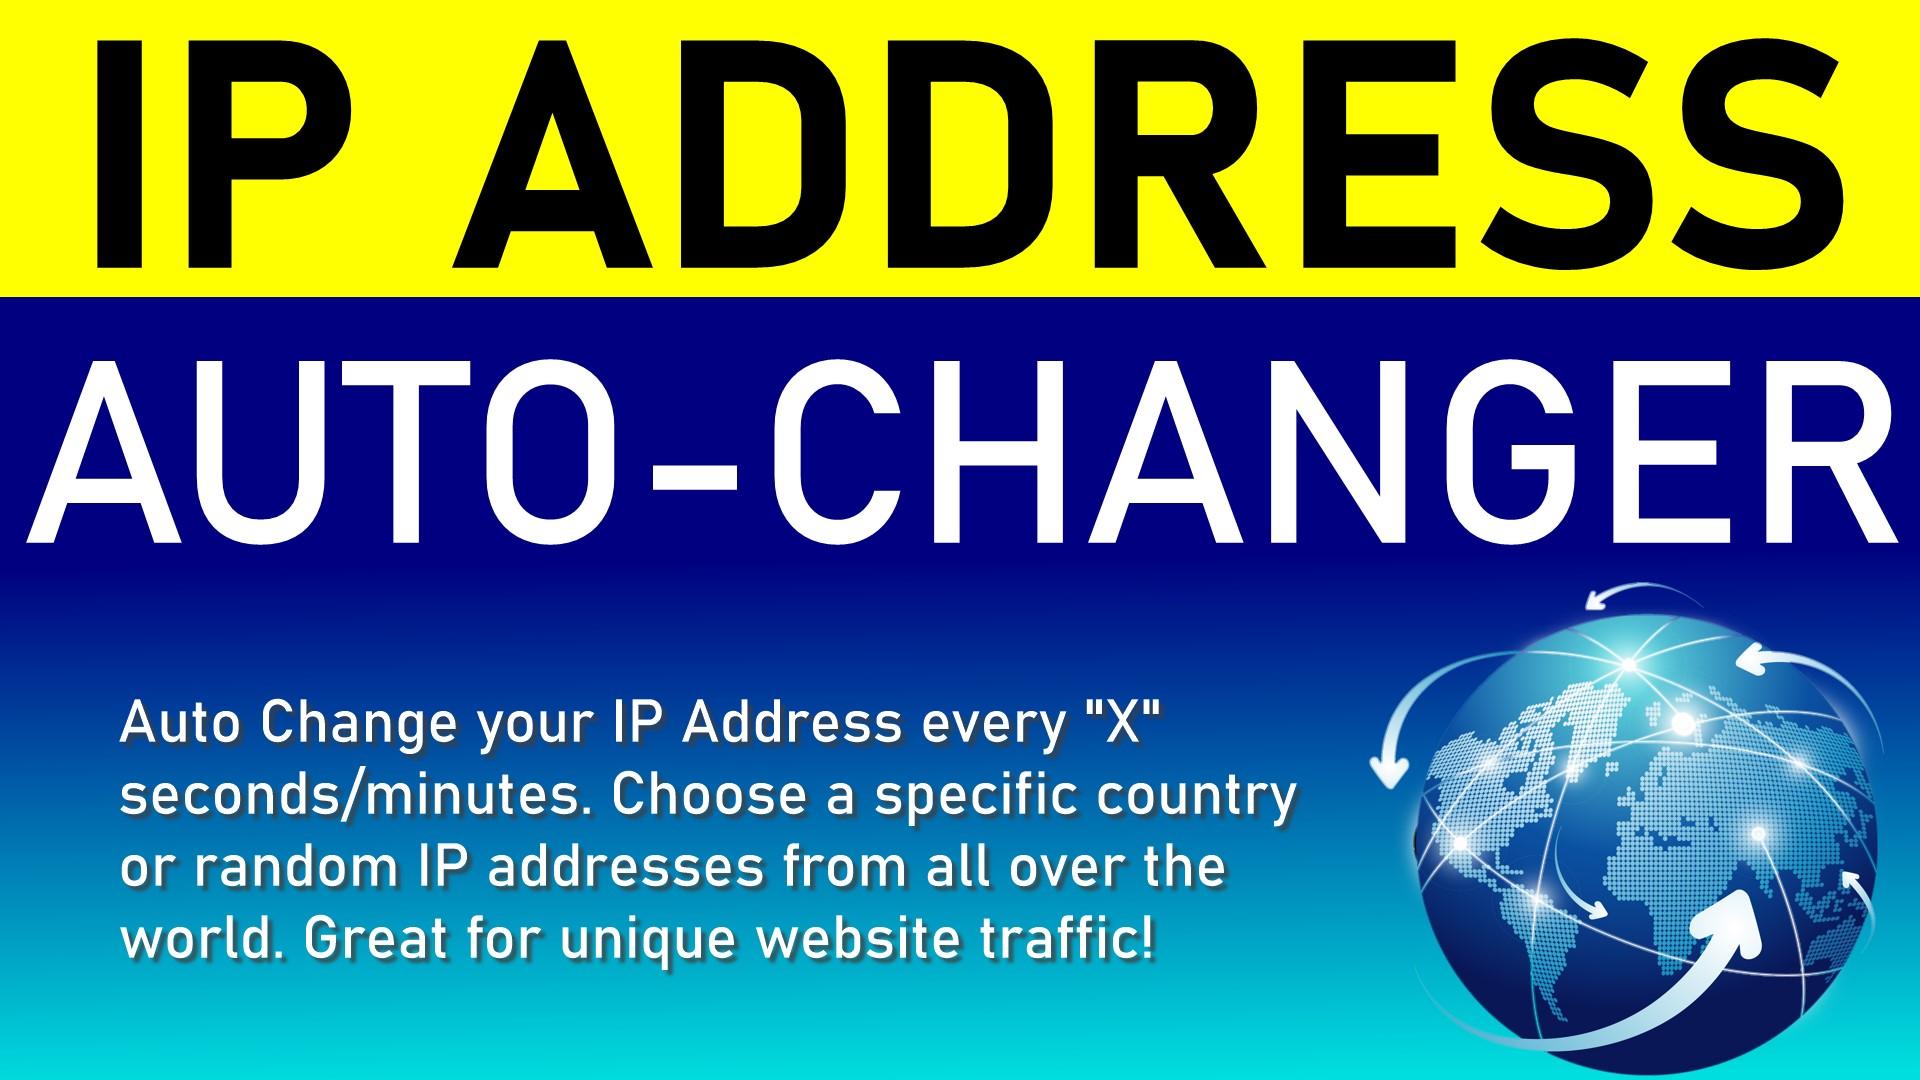 Auto VPN change IP Address every x seconds - thousands of Worldwide IP Addresses